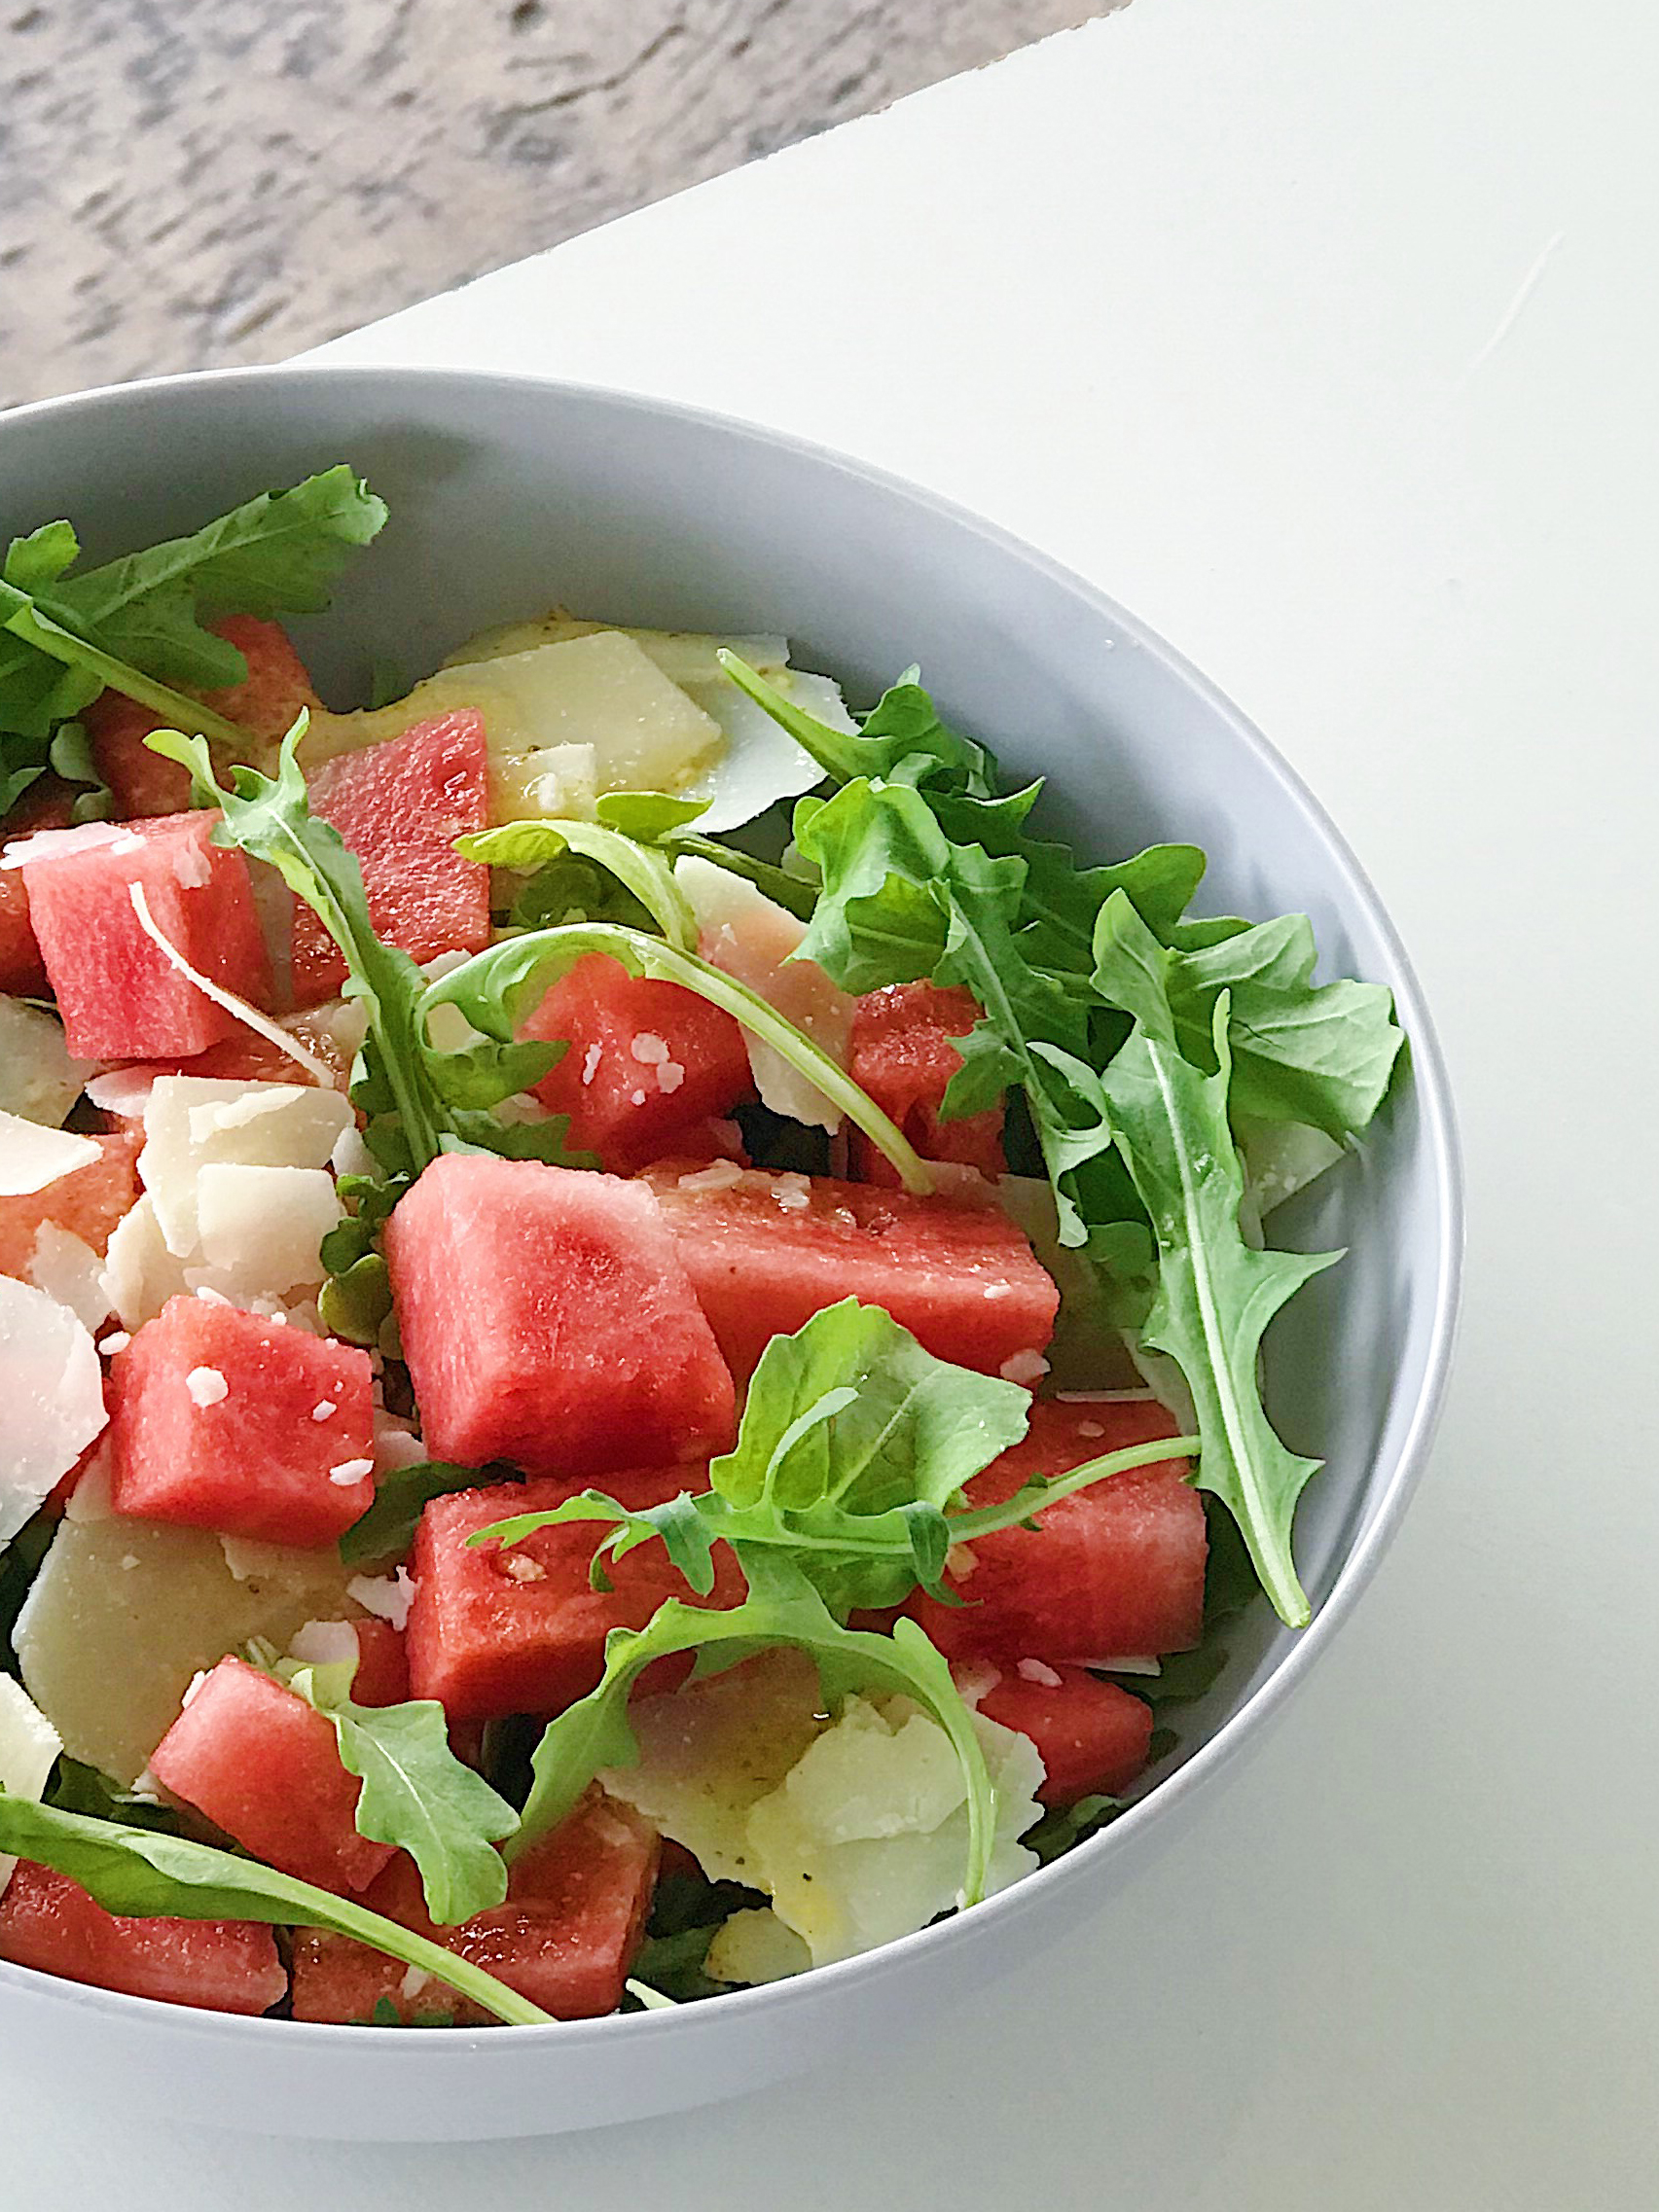 Watermelon Arugula and Parmesan Salad Recipe